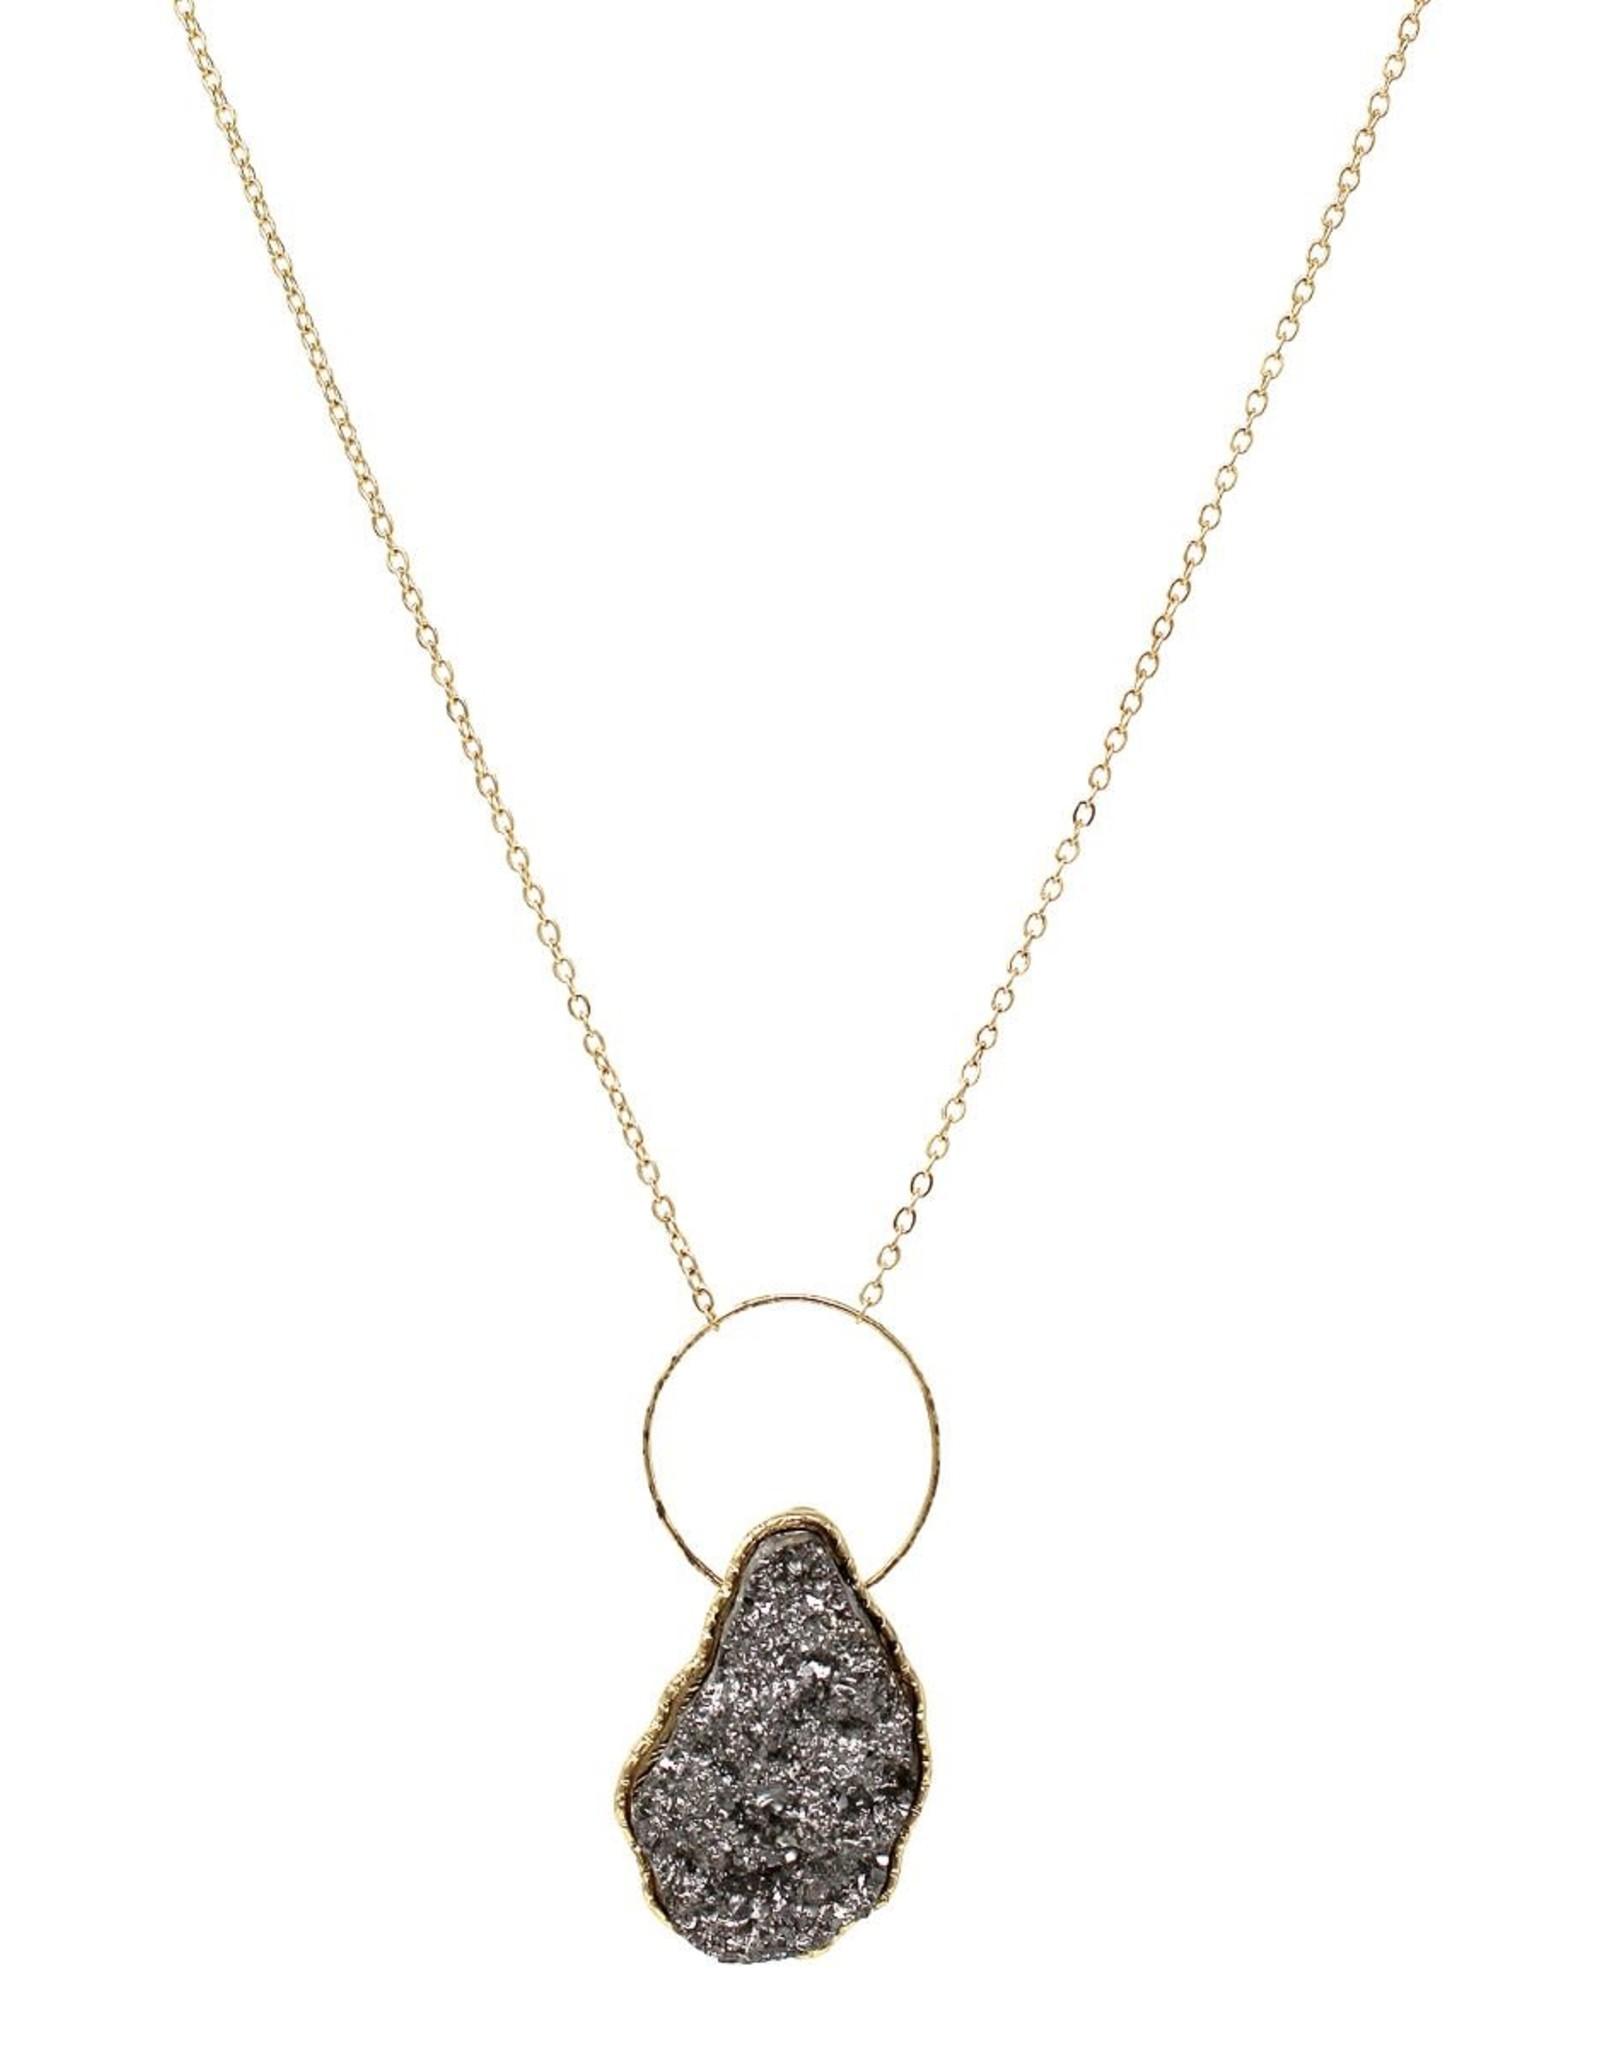 Skinny Hoop Druzy Stone Pendant Long Necklace - Hematite